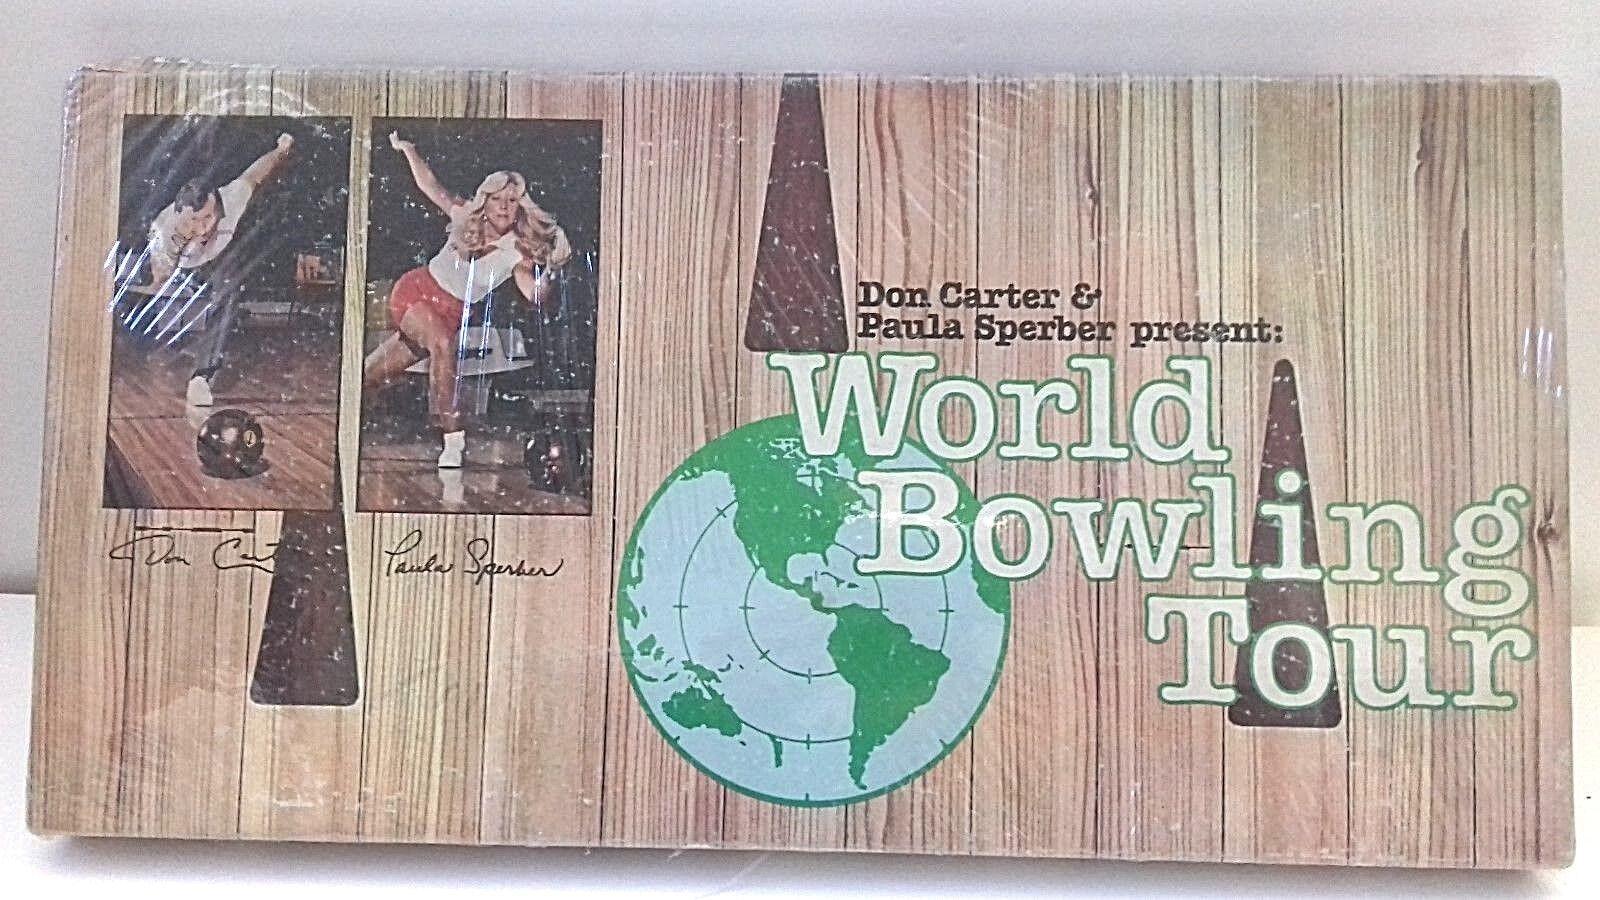 VTGNOSSEALED World Bowling TourBoard Game Don Carter & Paula Sperber 1979